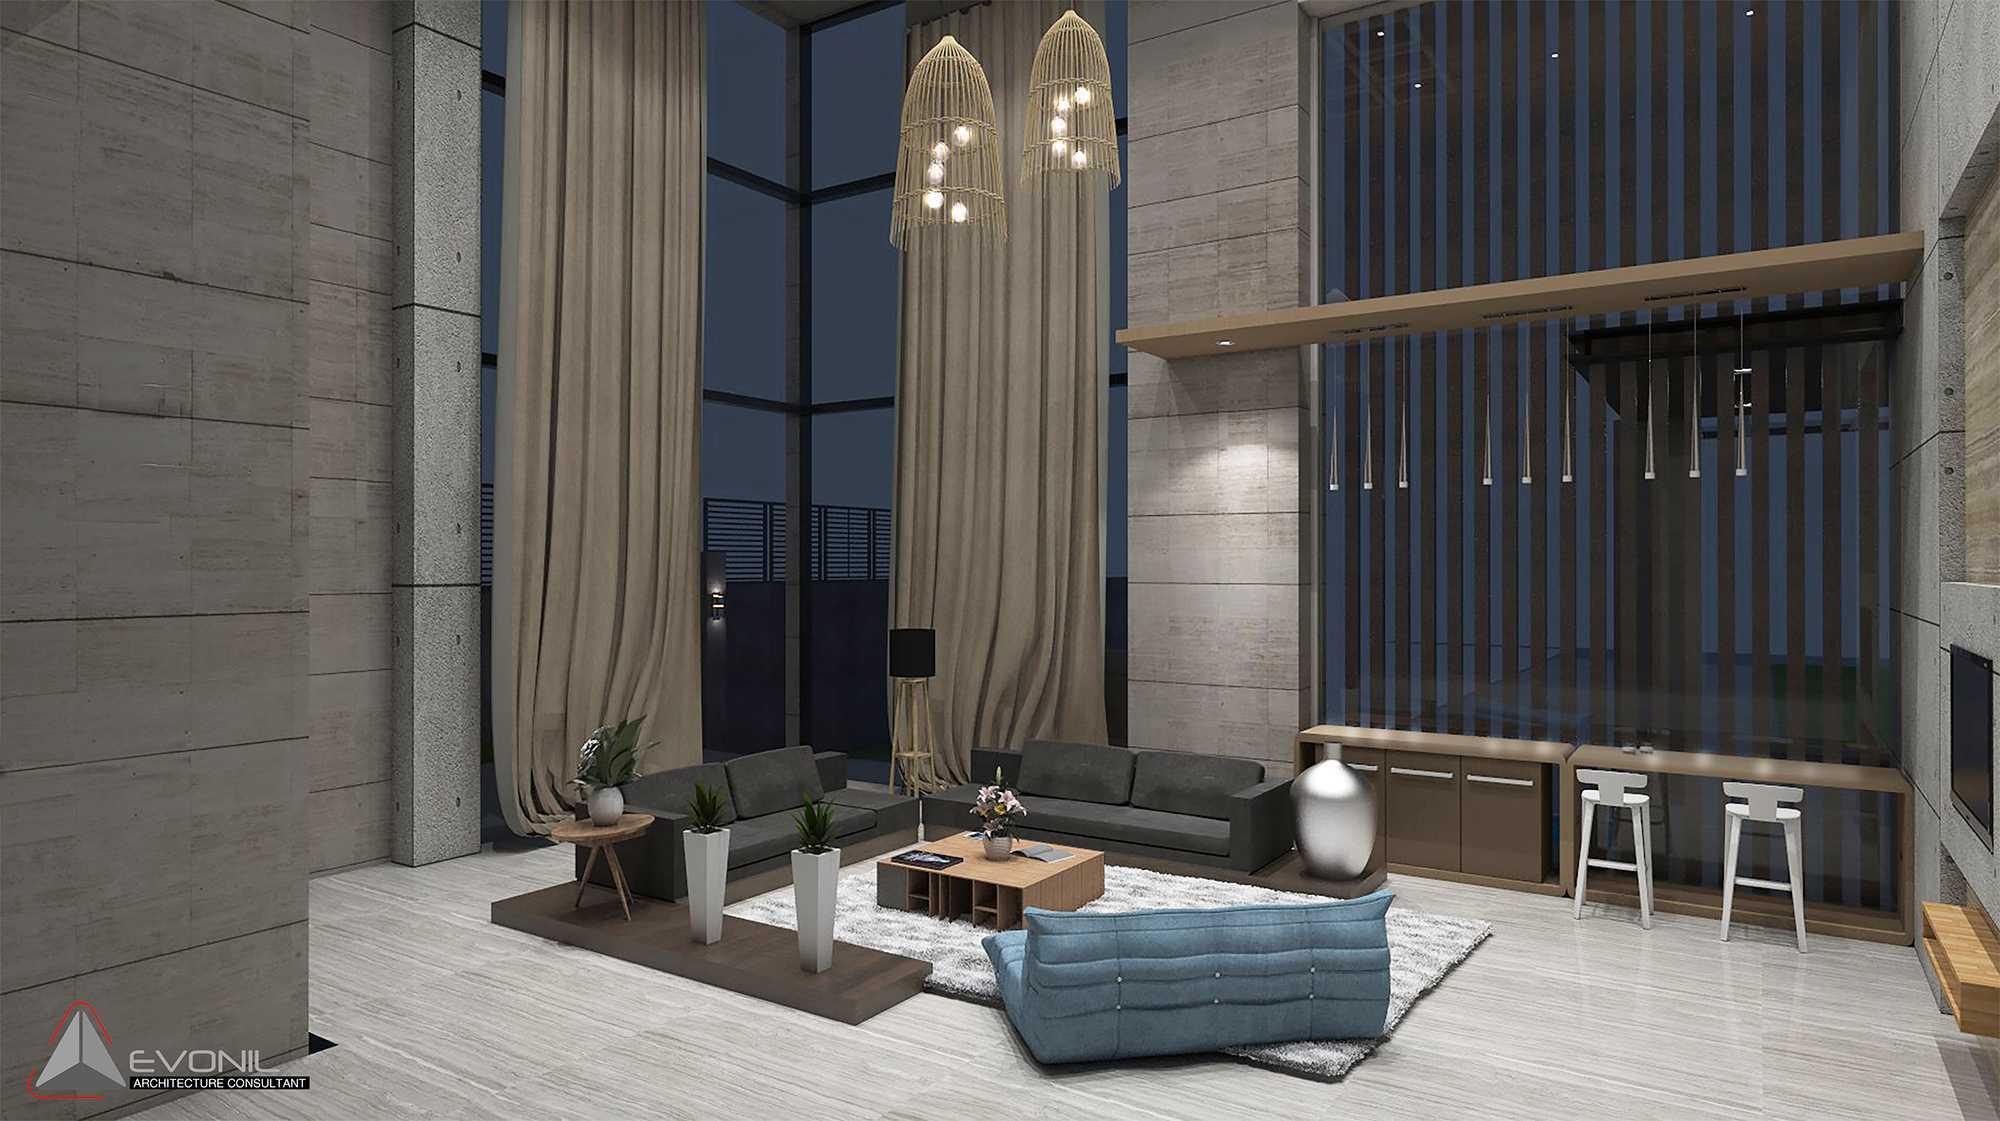 Evonil Architecture Residence Pangkalan Bun Pangkalan Bun, Kalimantan, Indonesia Pangkalan Bun, Kalimantan, Indonesia Guest-Room-Night-Residence-Pangkalan-Bun Modern  13135